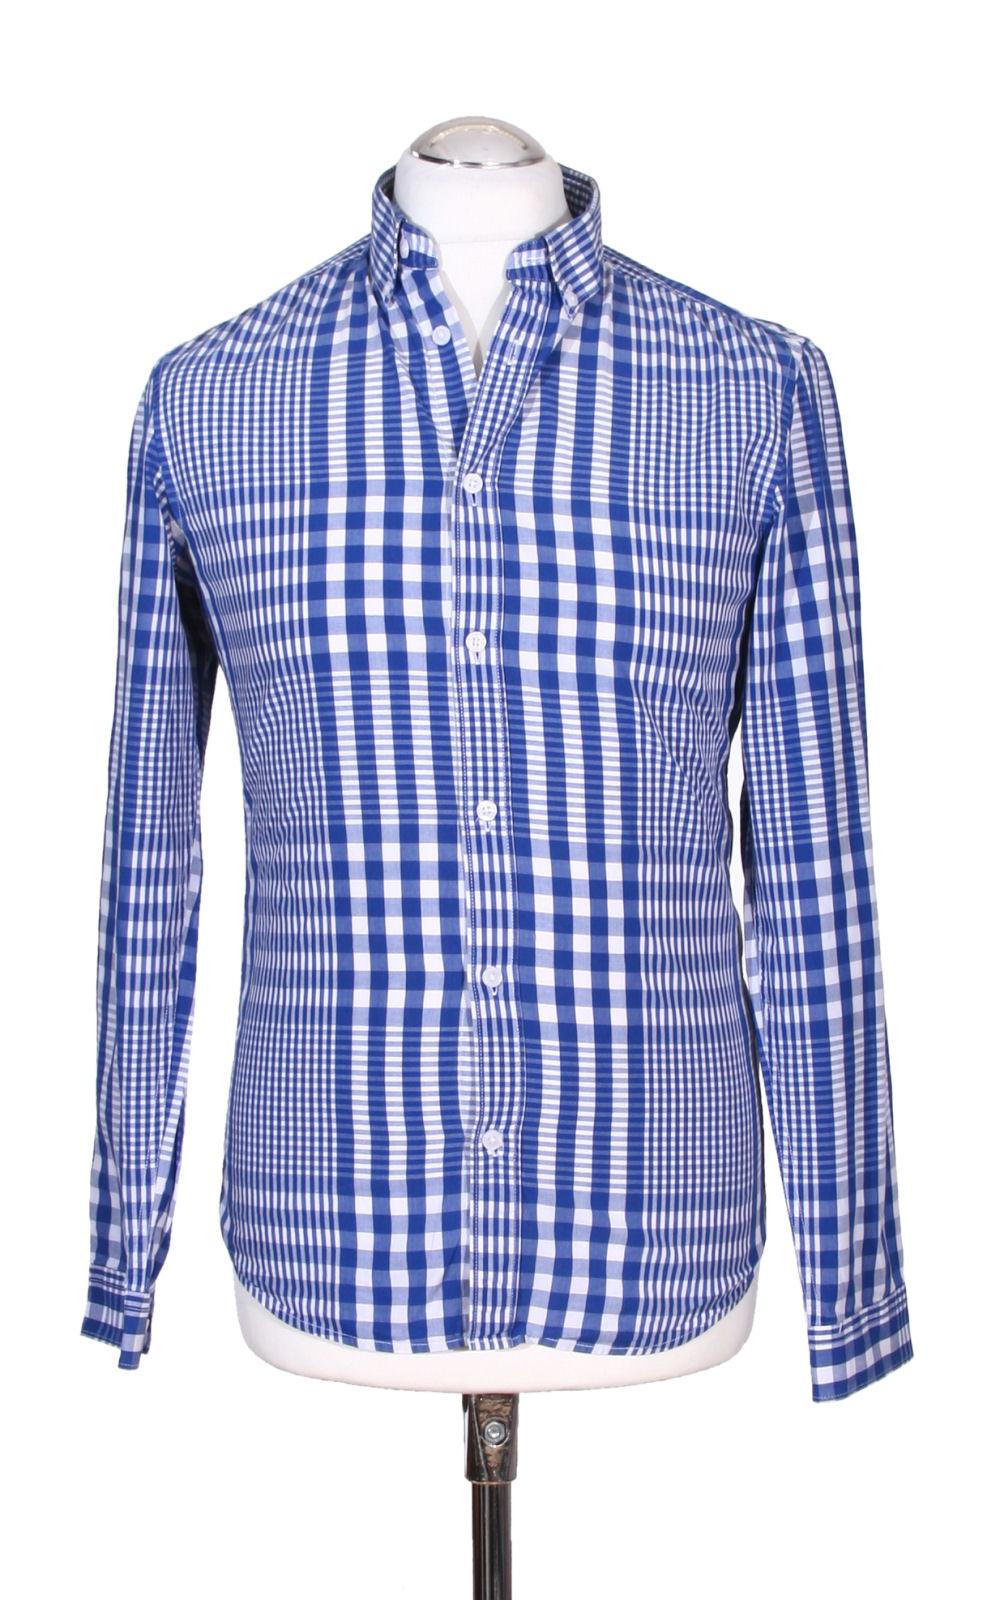 a44991e7d6 Férfi ruházat | Férfi Ing hosszú, H&M, Méret: S | http://www ...